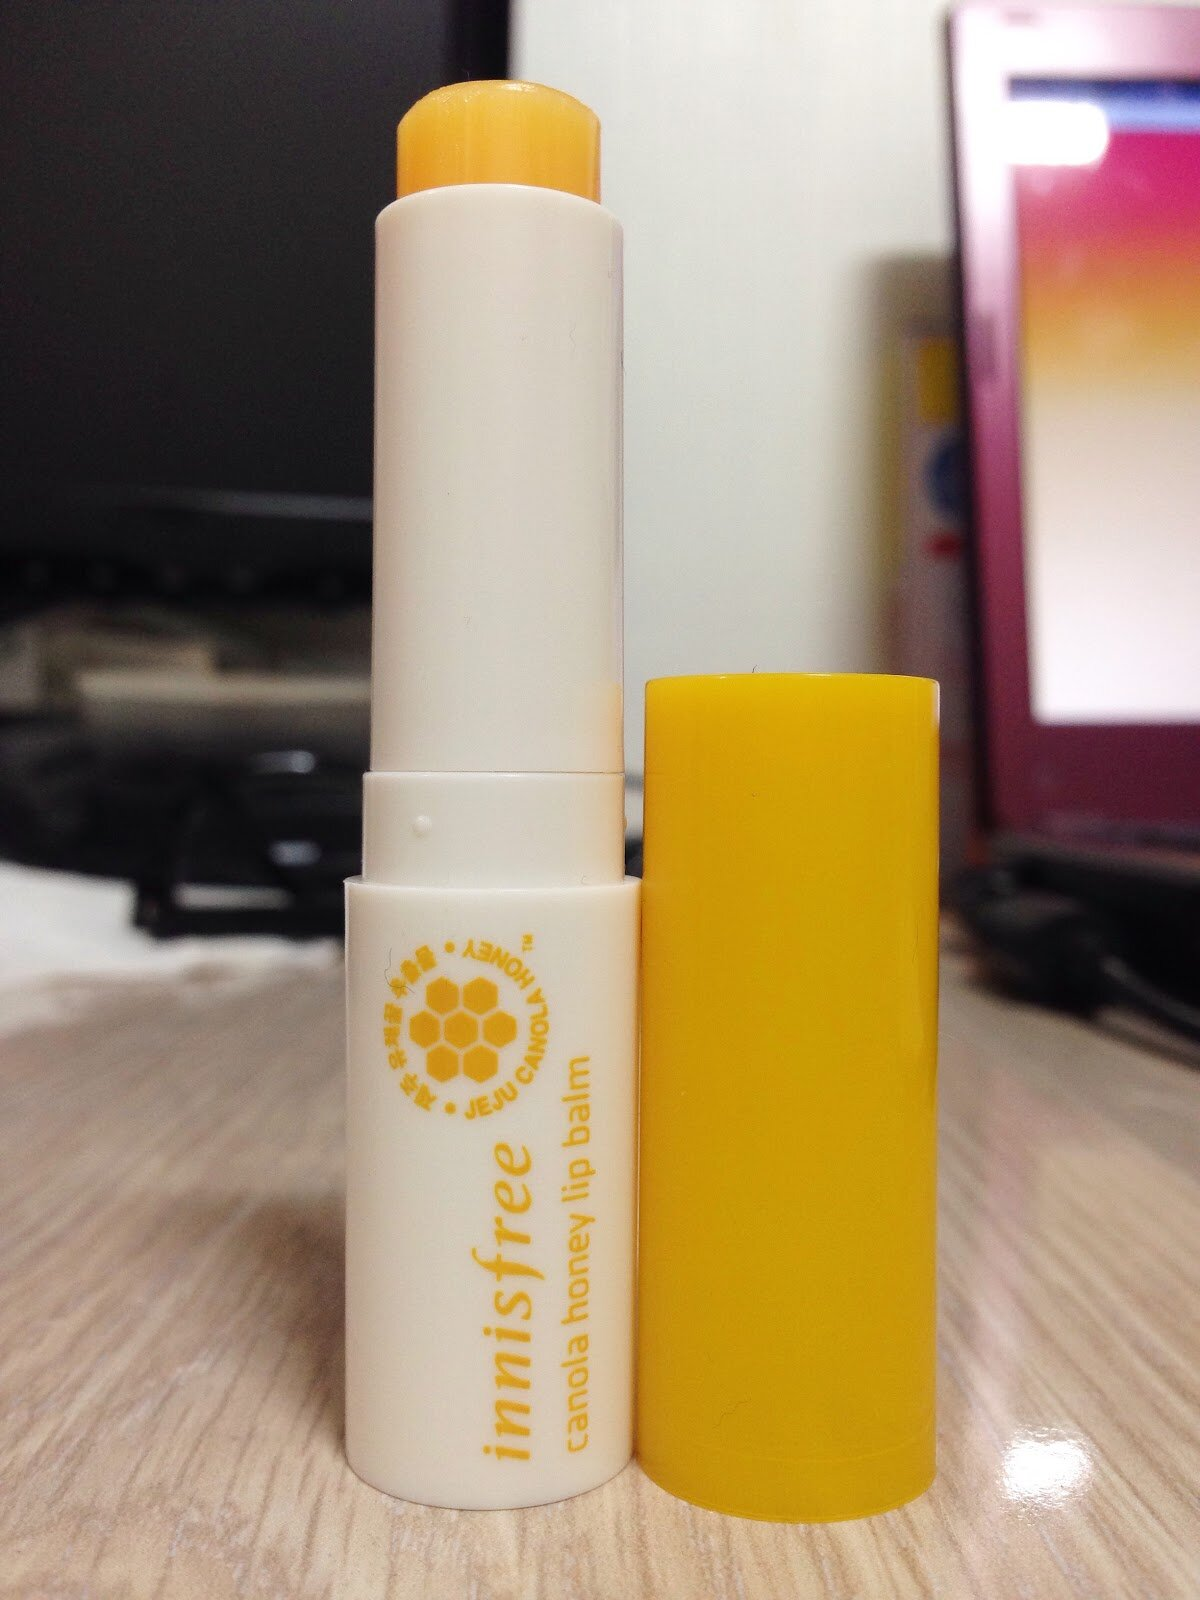 Son dưỡng môi Innisfree Canola honey lip balm stick